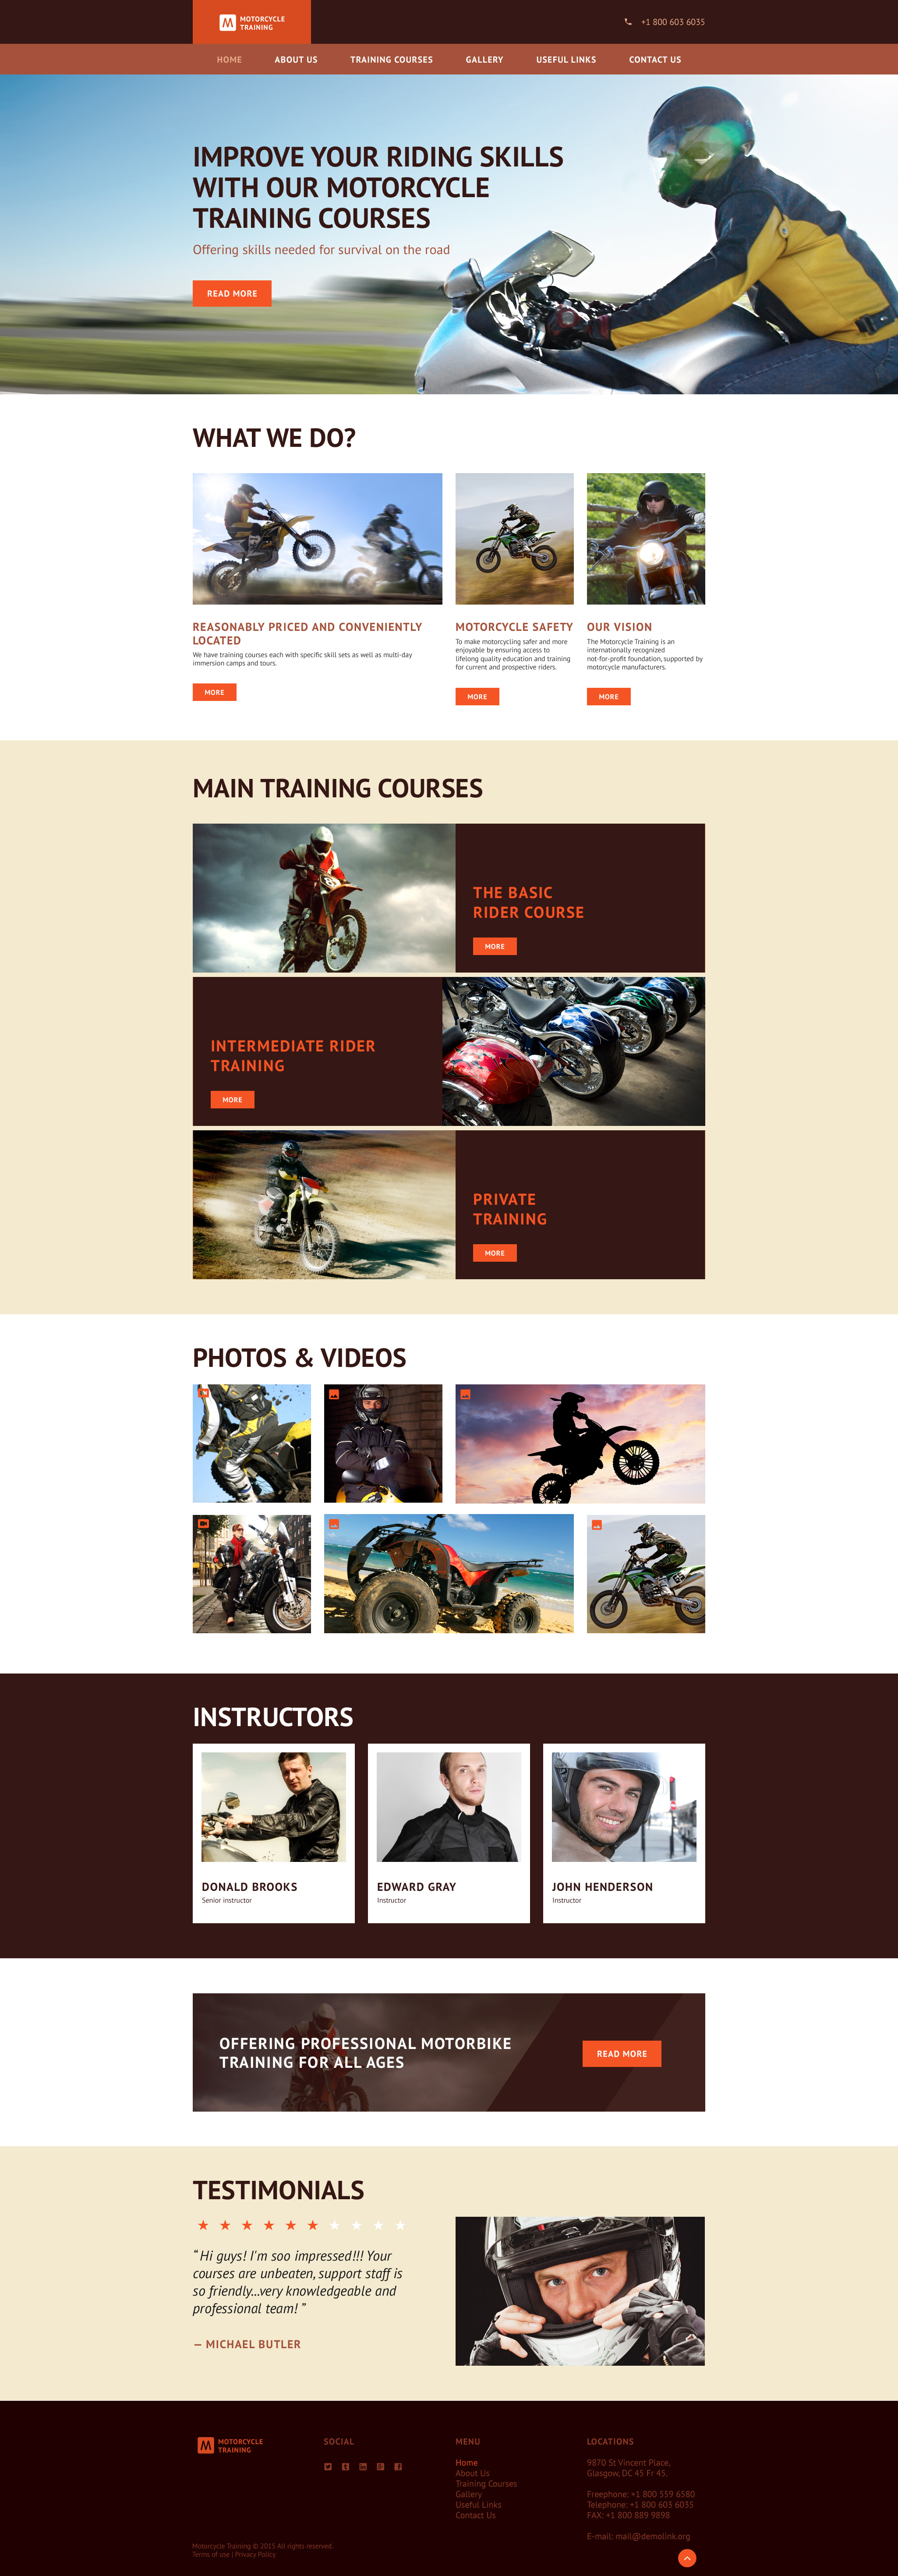 Motorcycle Training Website Template - screenshot